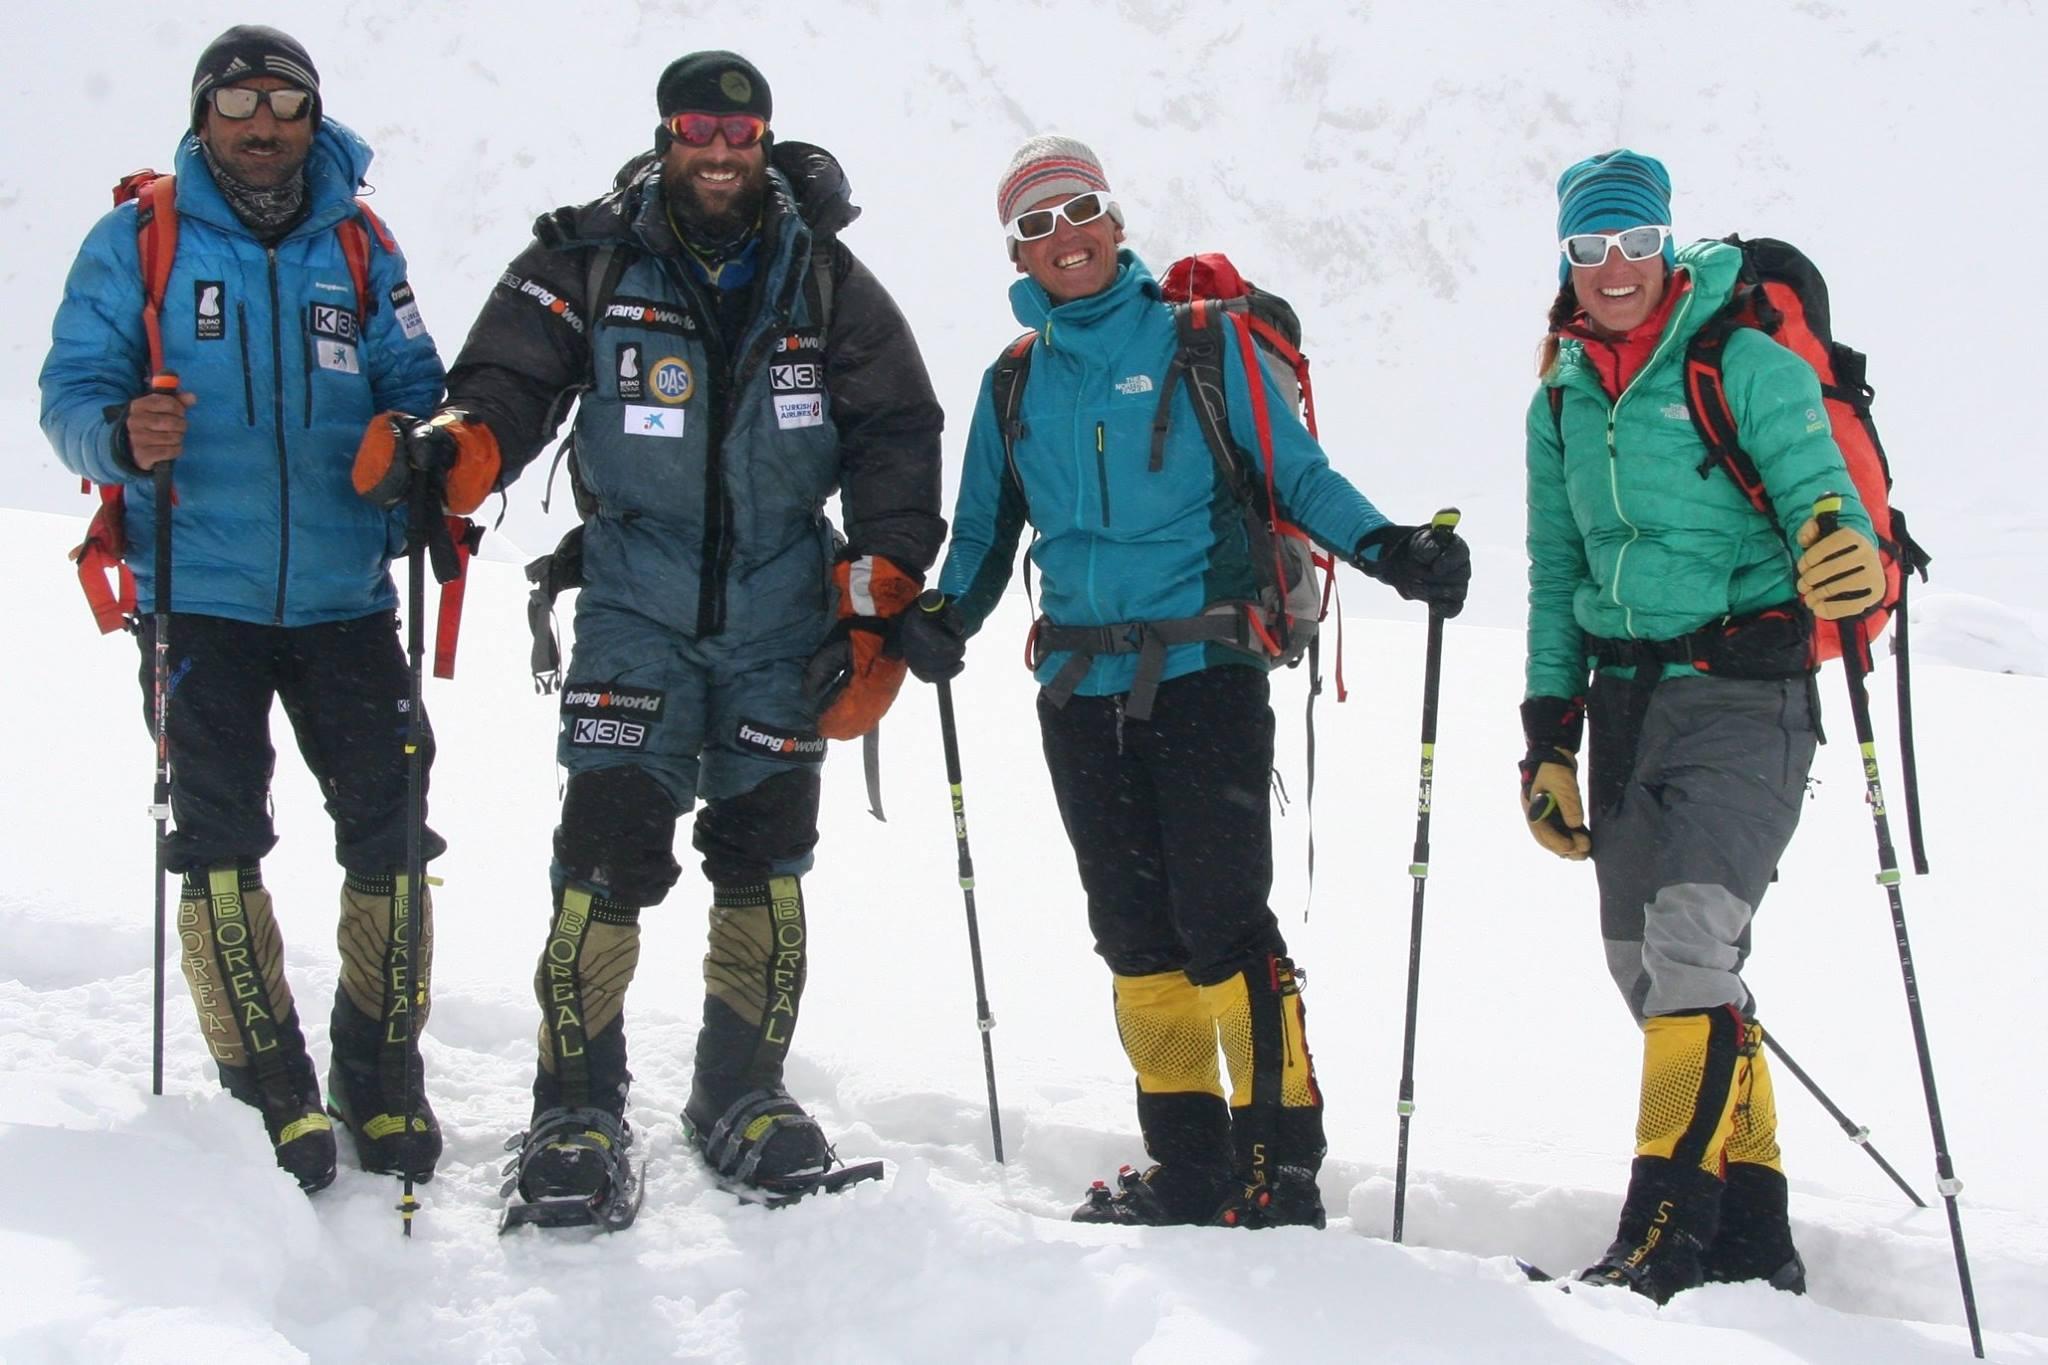 First-ever winter ascent of Nanga Parbat